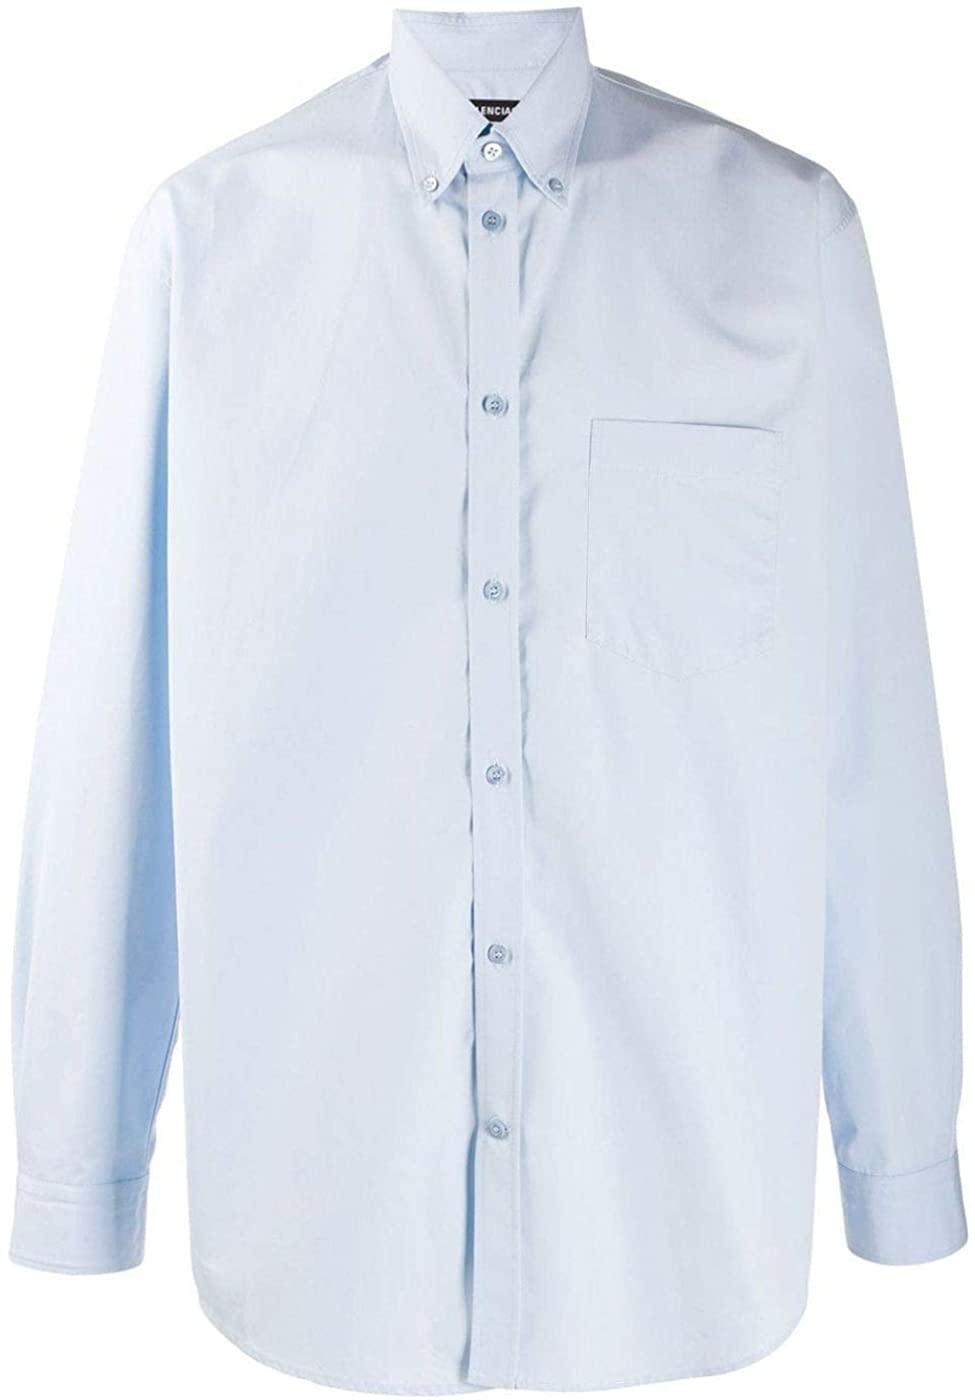 Balenciaga Luxury Fashion Man 508465TYB184850 Light Blue Cotton Shirt | Fall Winter 19